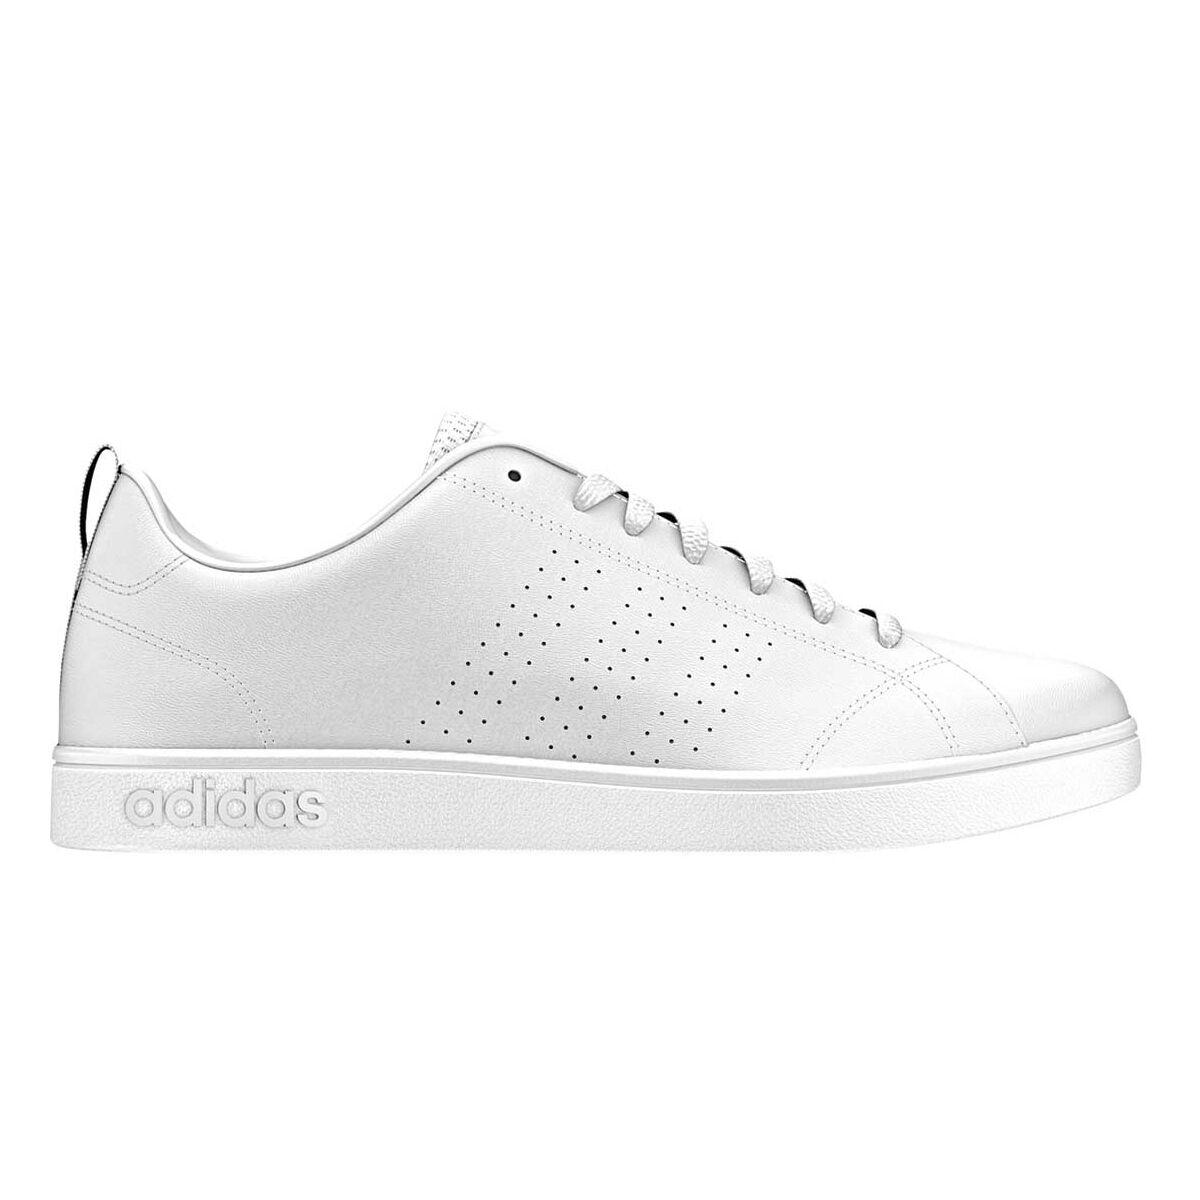 Adidas Us casual Neo White Vs Advantage 8 Clean Heren schoenen FrRwF1q